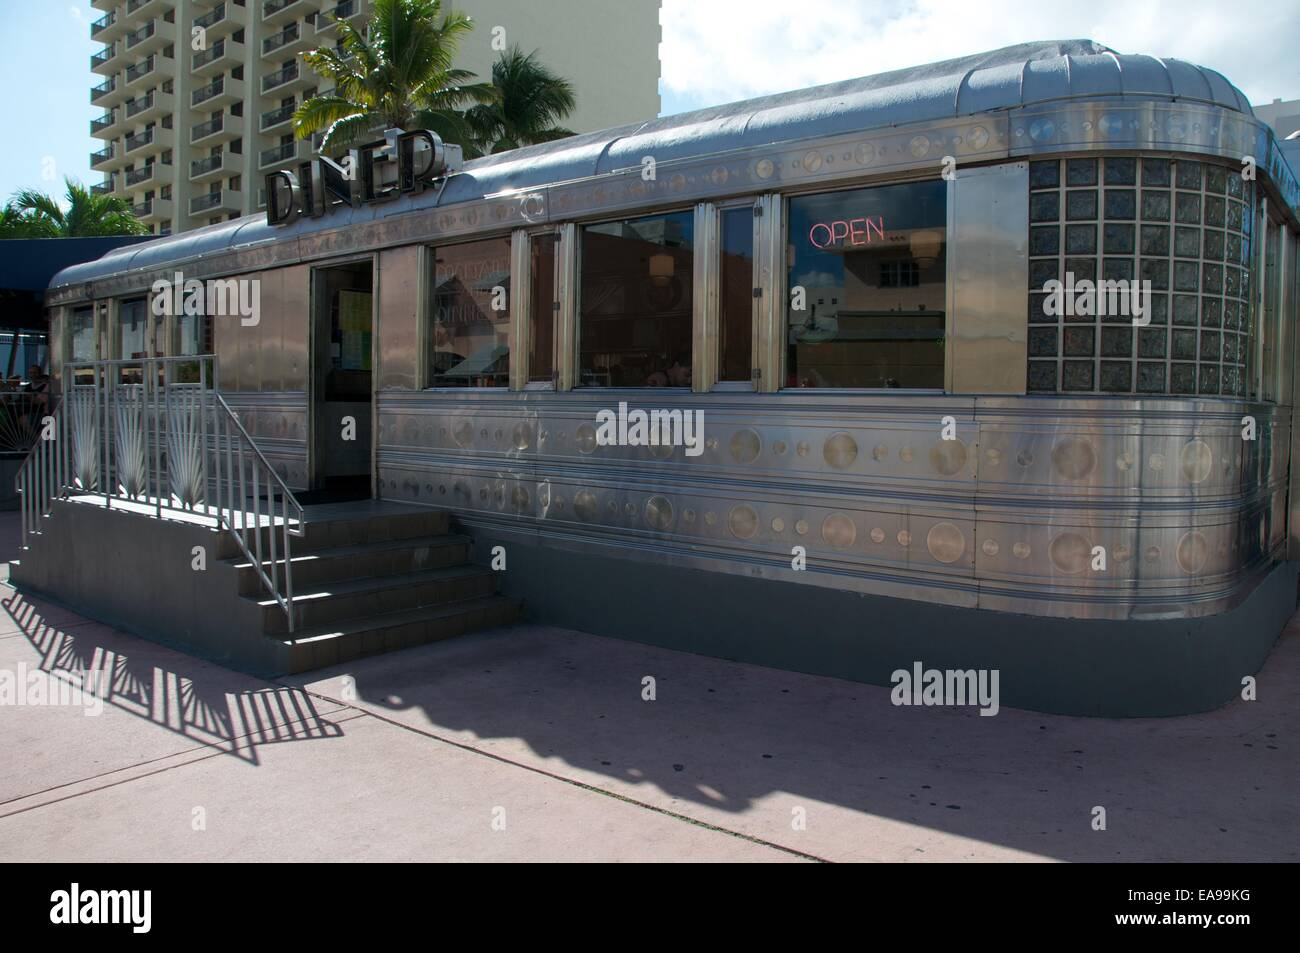 american diner ex pennsylvania eisenbahn wagen aluminium retro stil art deco district south. Black Bedroom Furniture Sets. Home Design Ideas